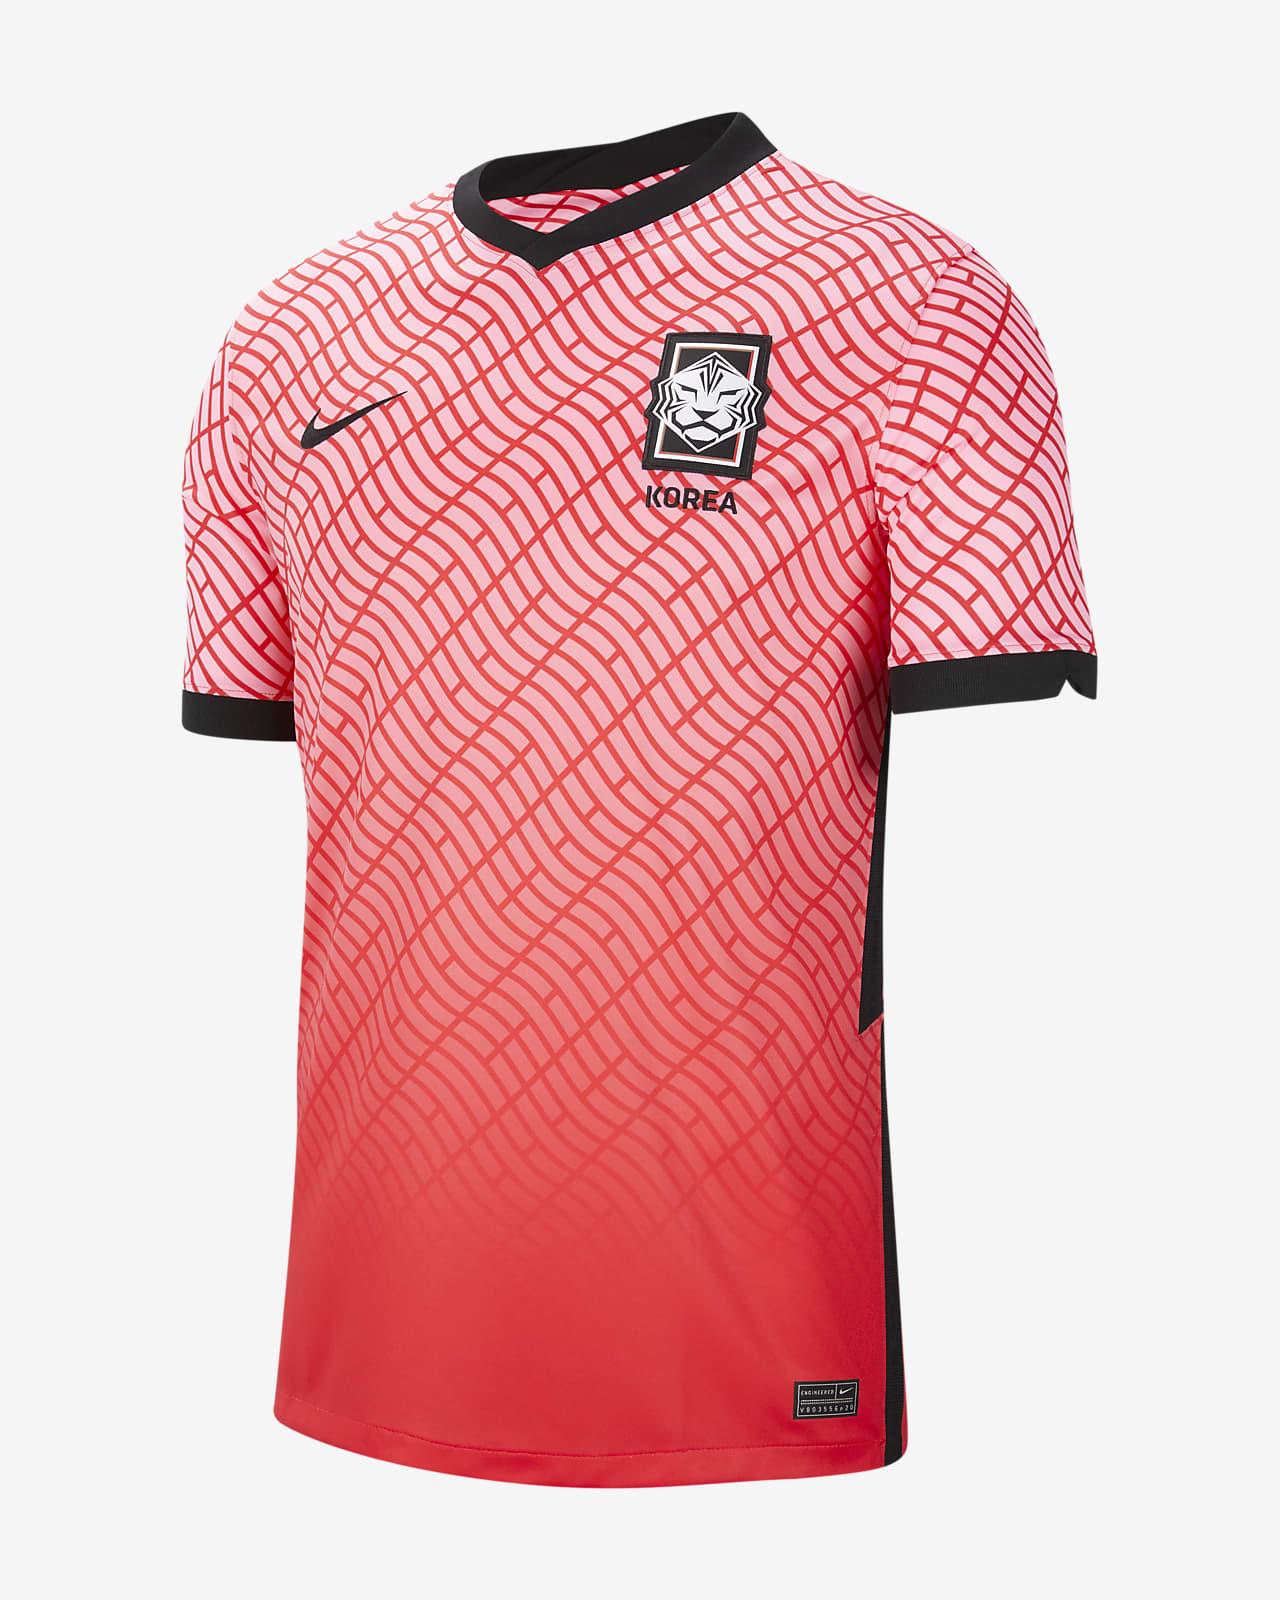 Korea 2020 Stadium Home Men's Soccer Jersey